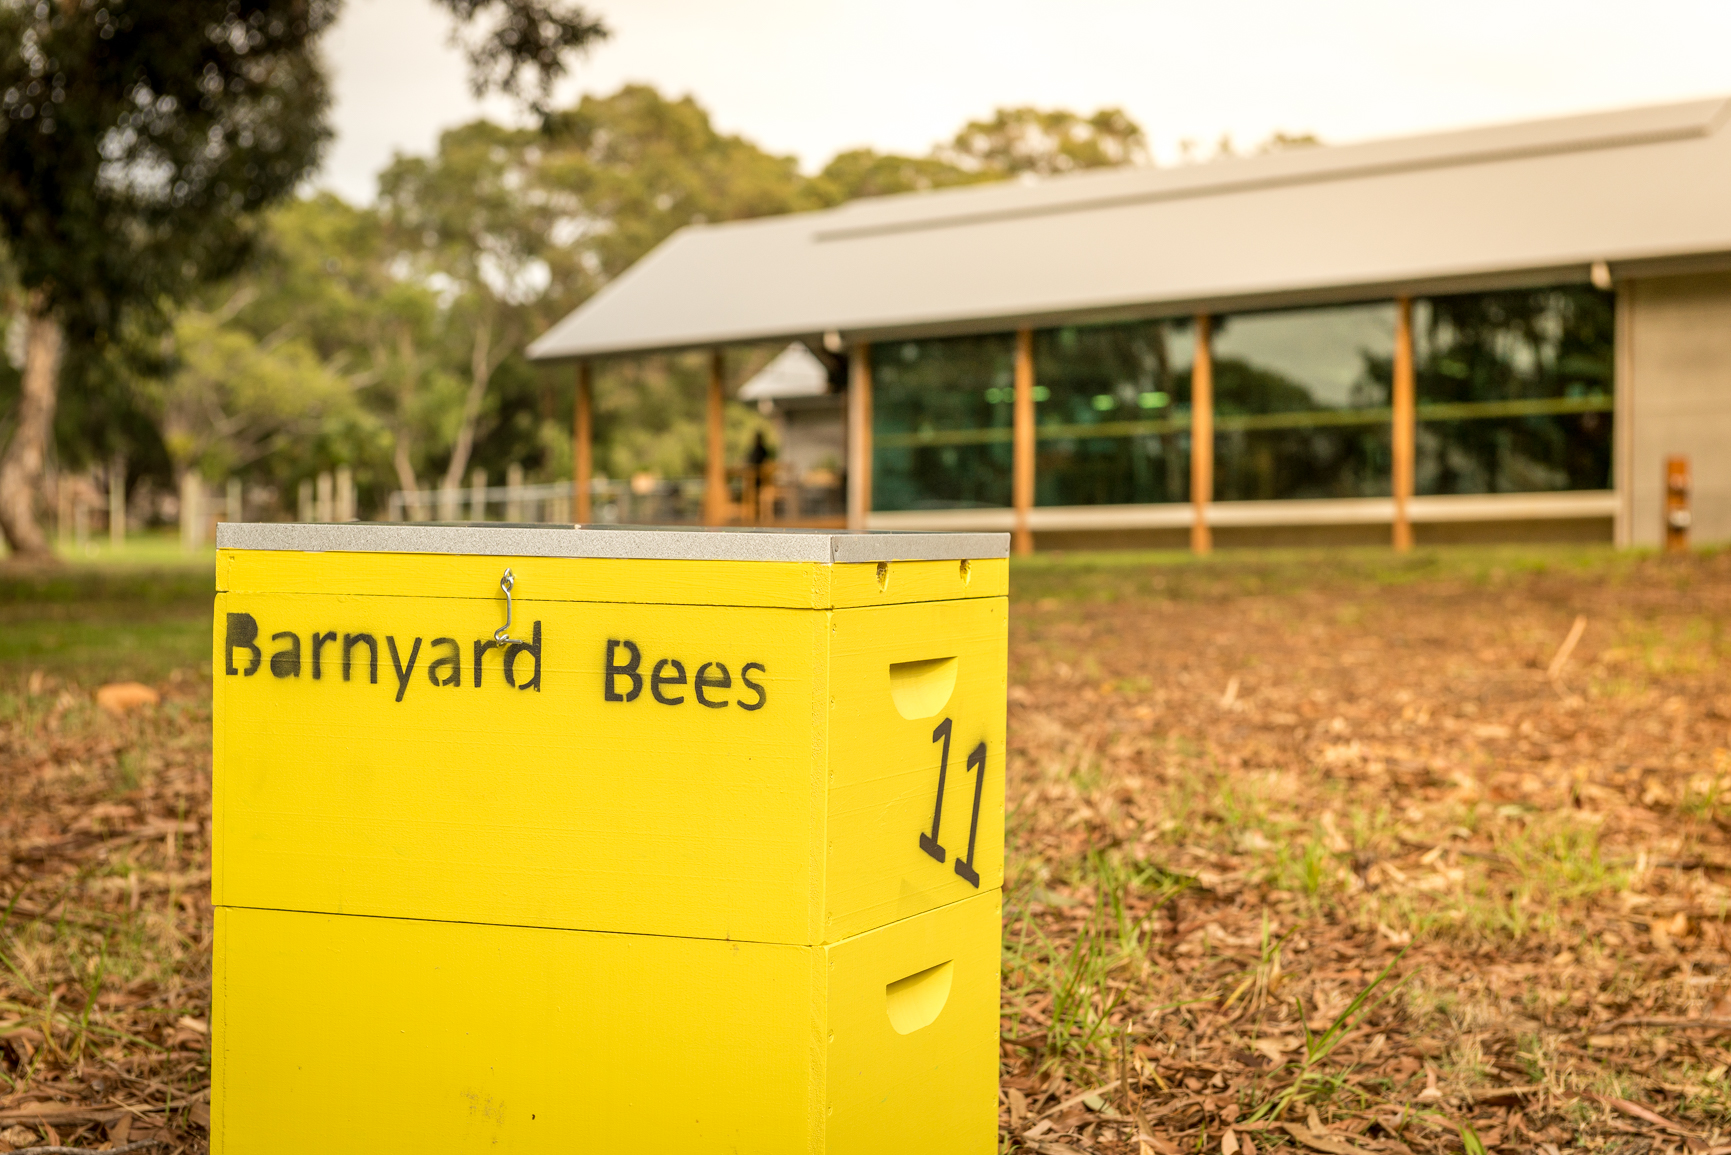 Barnyard bees1.jpg